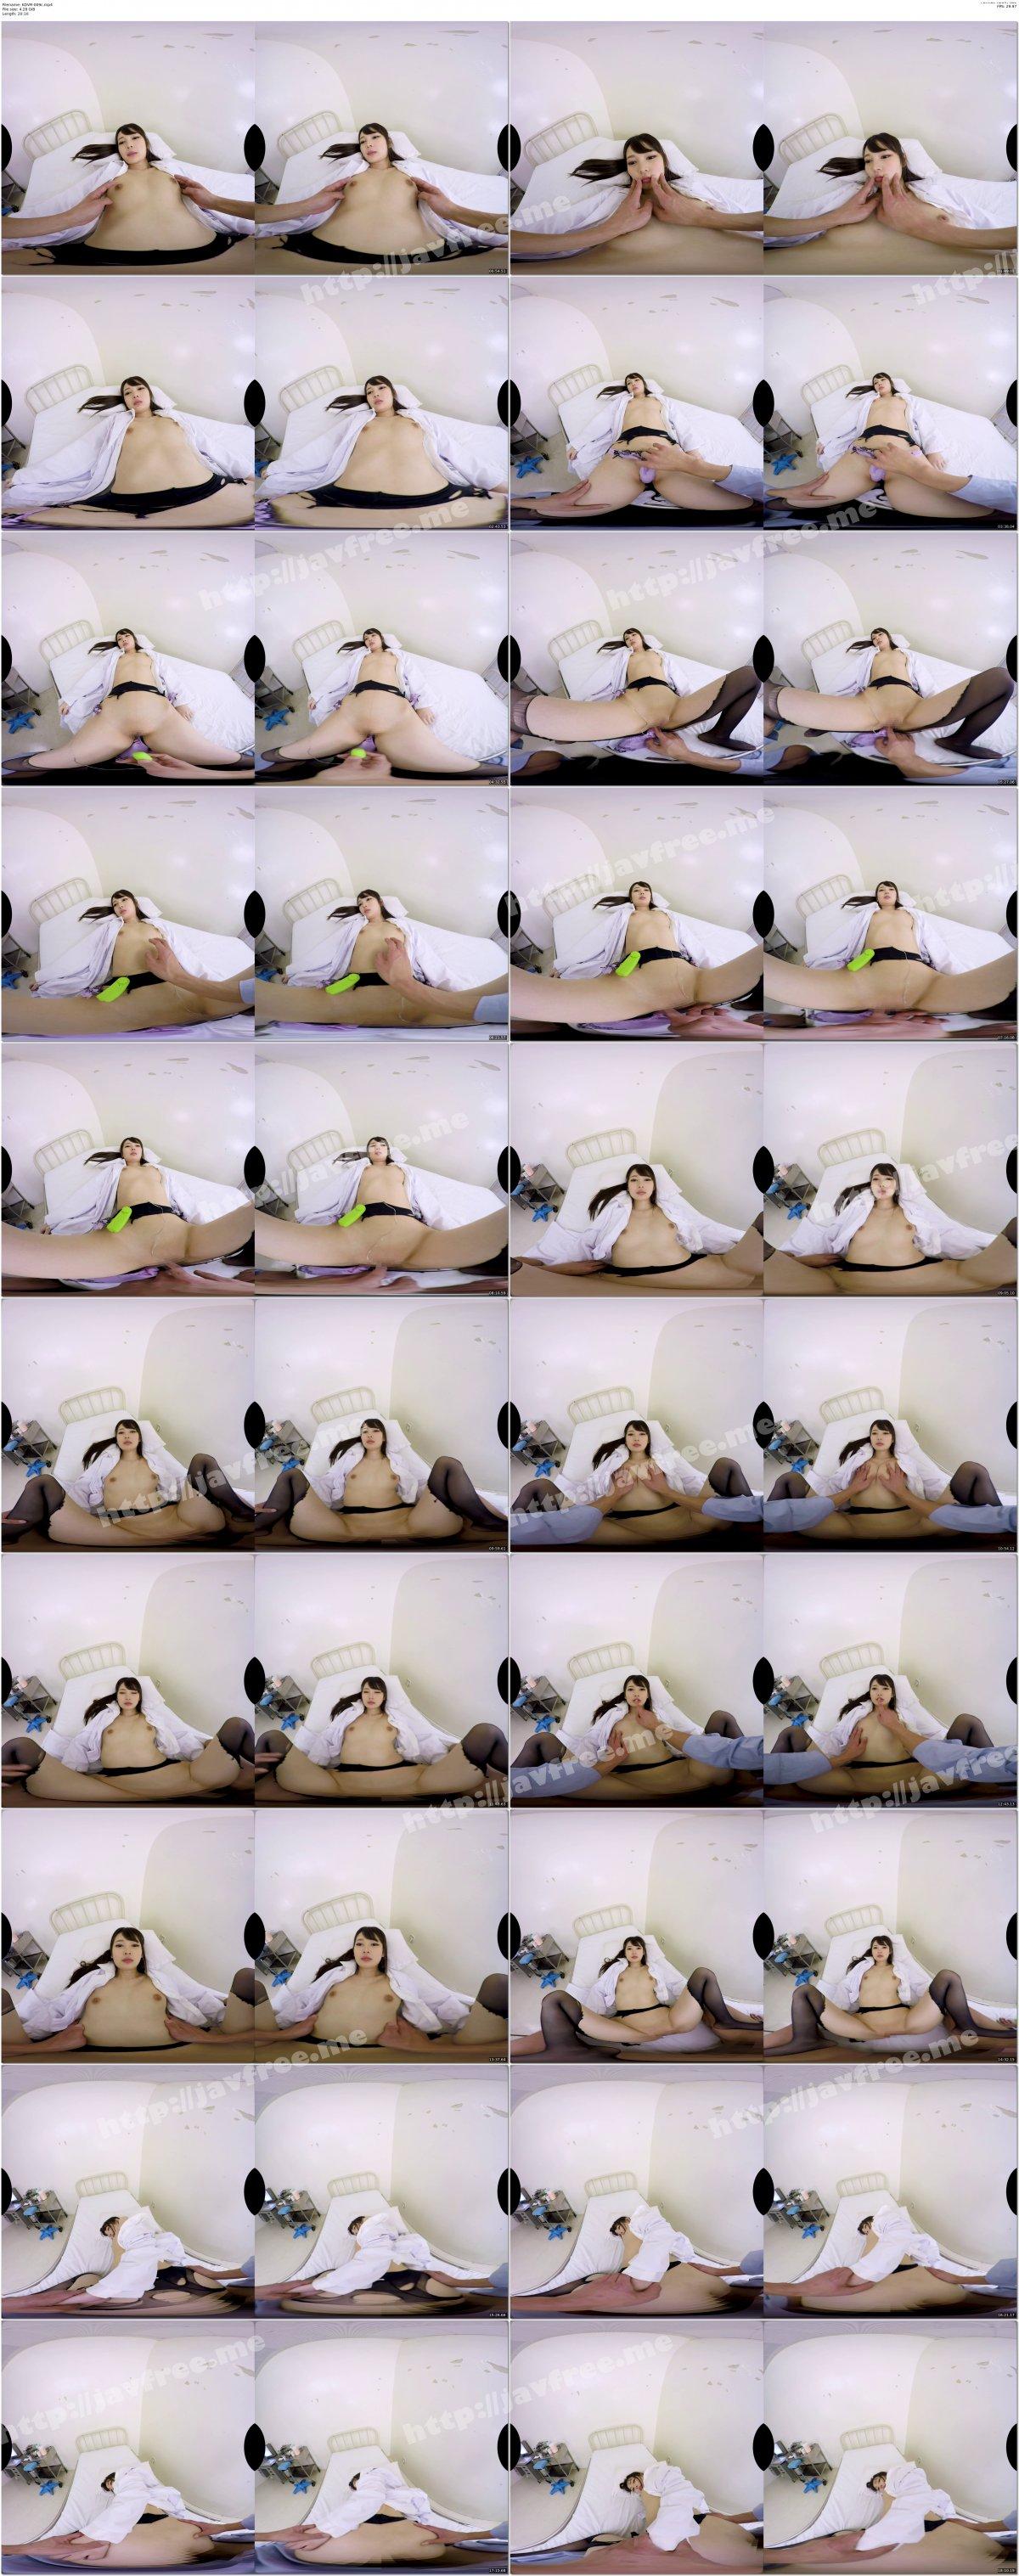 [KDVR-009] 【VR】STOP!! 不思議な時計で時間停止!! 時を止めて気づかれずに女医を犯す! 跡美しゅり完全STOP! 病院編 - image KDVR-009c on https://javfree.me